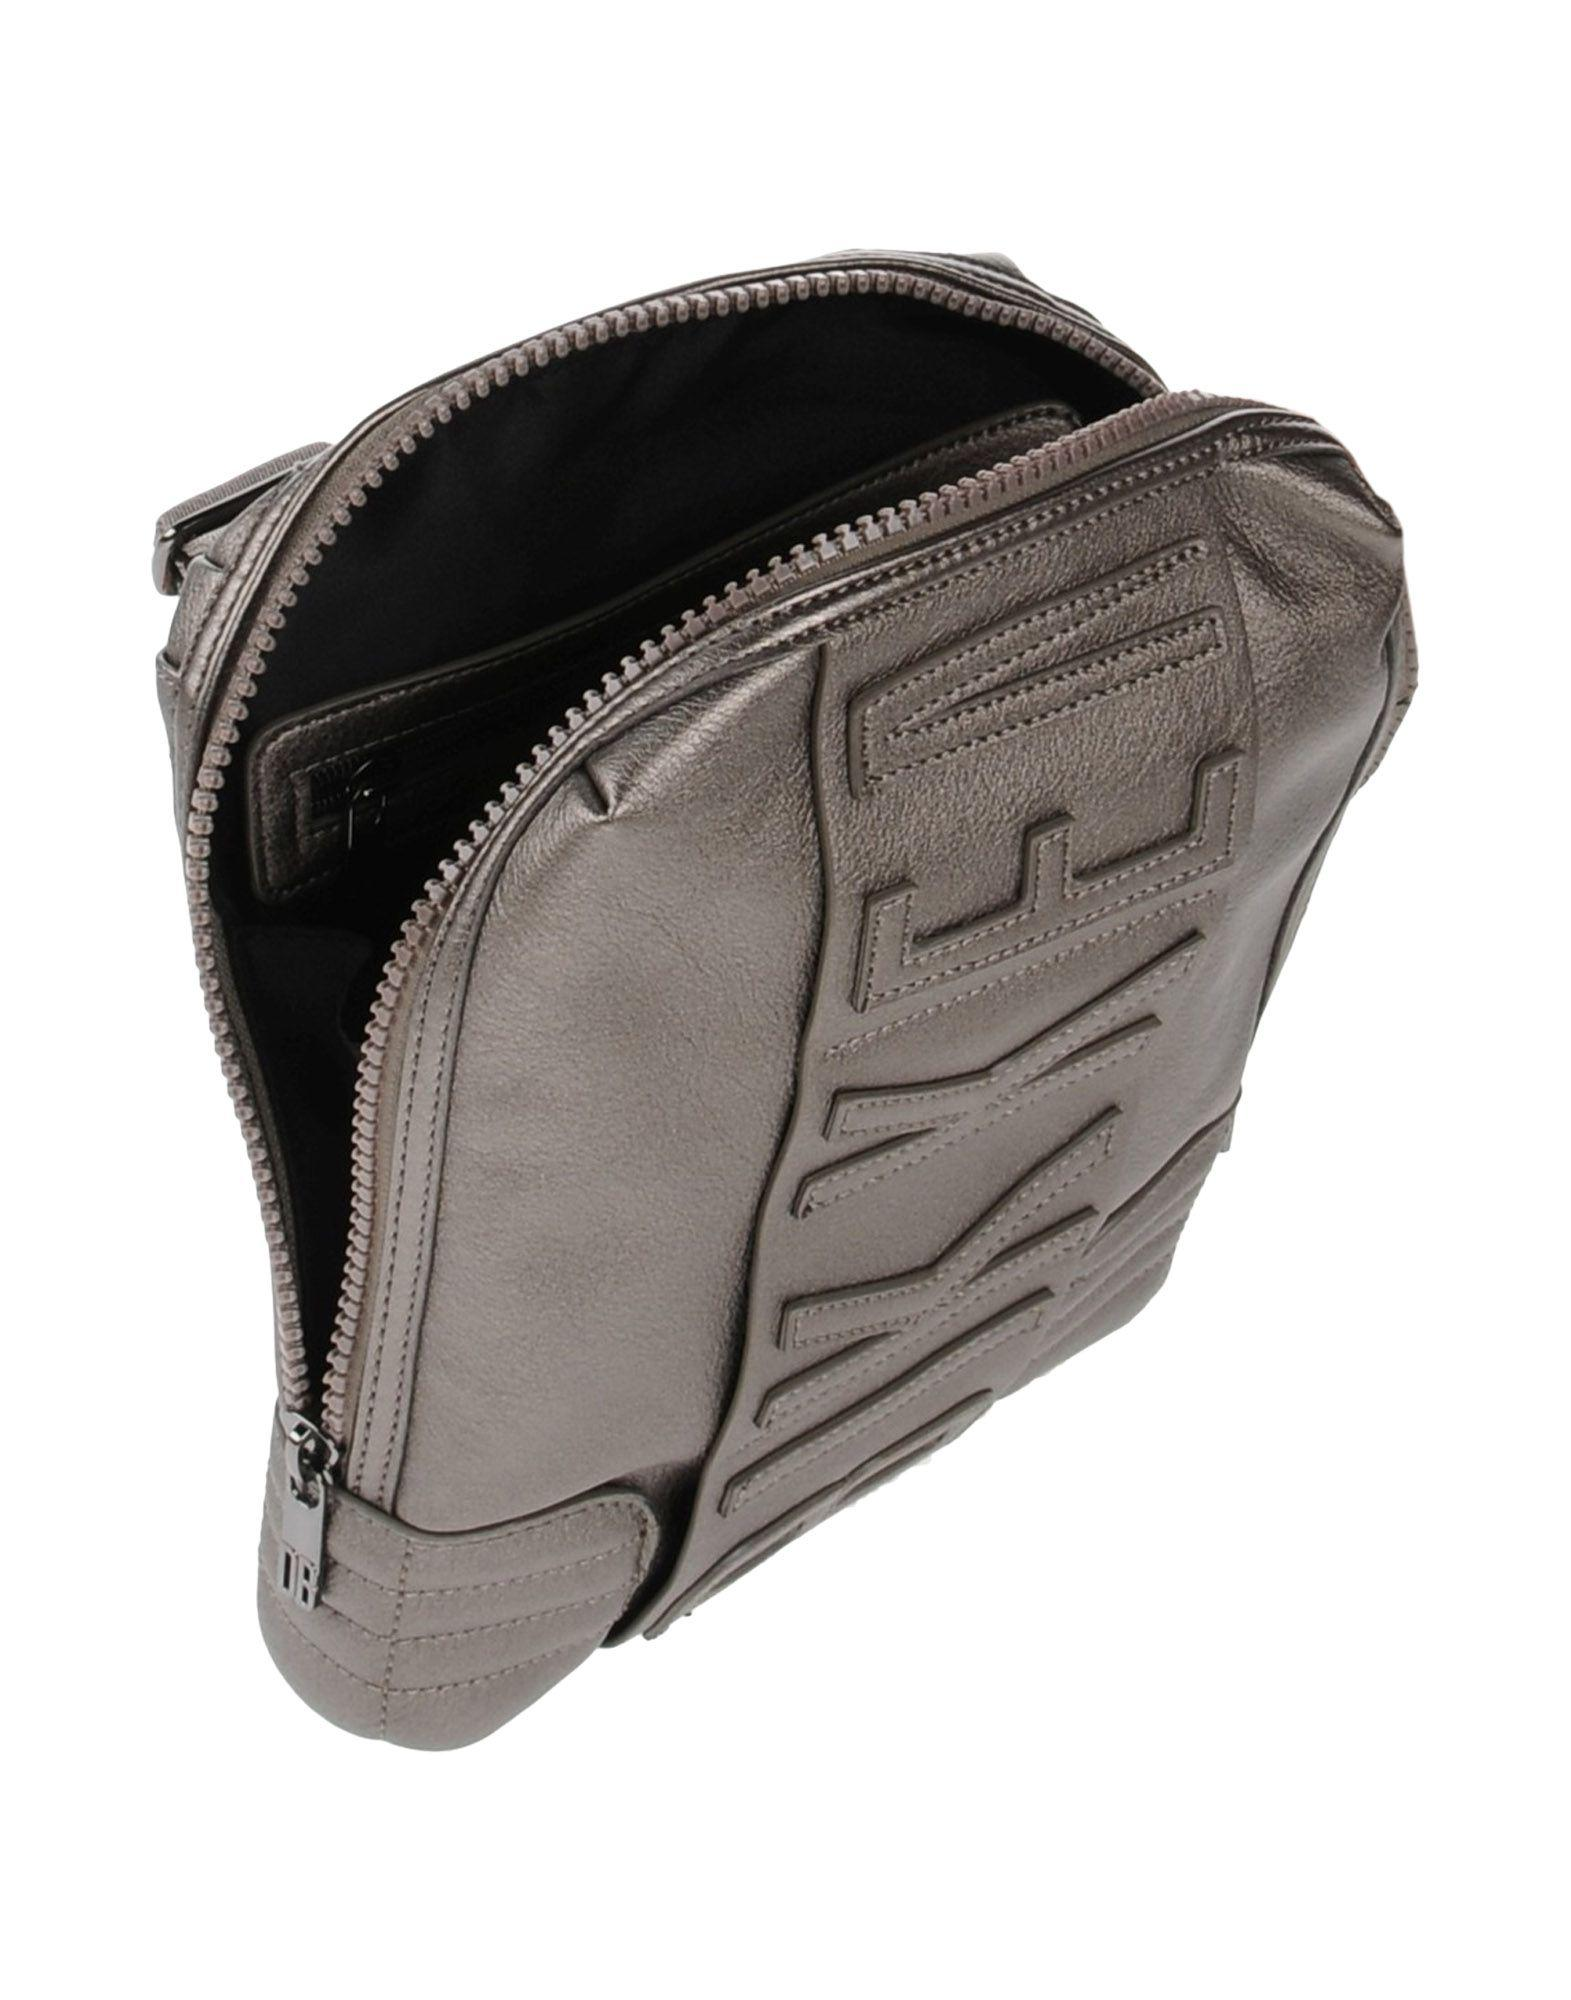 Bikkembergs Cross-body Bag in Lead (Grey) for Men